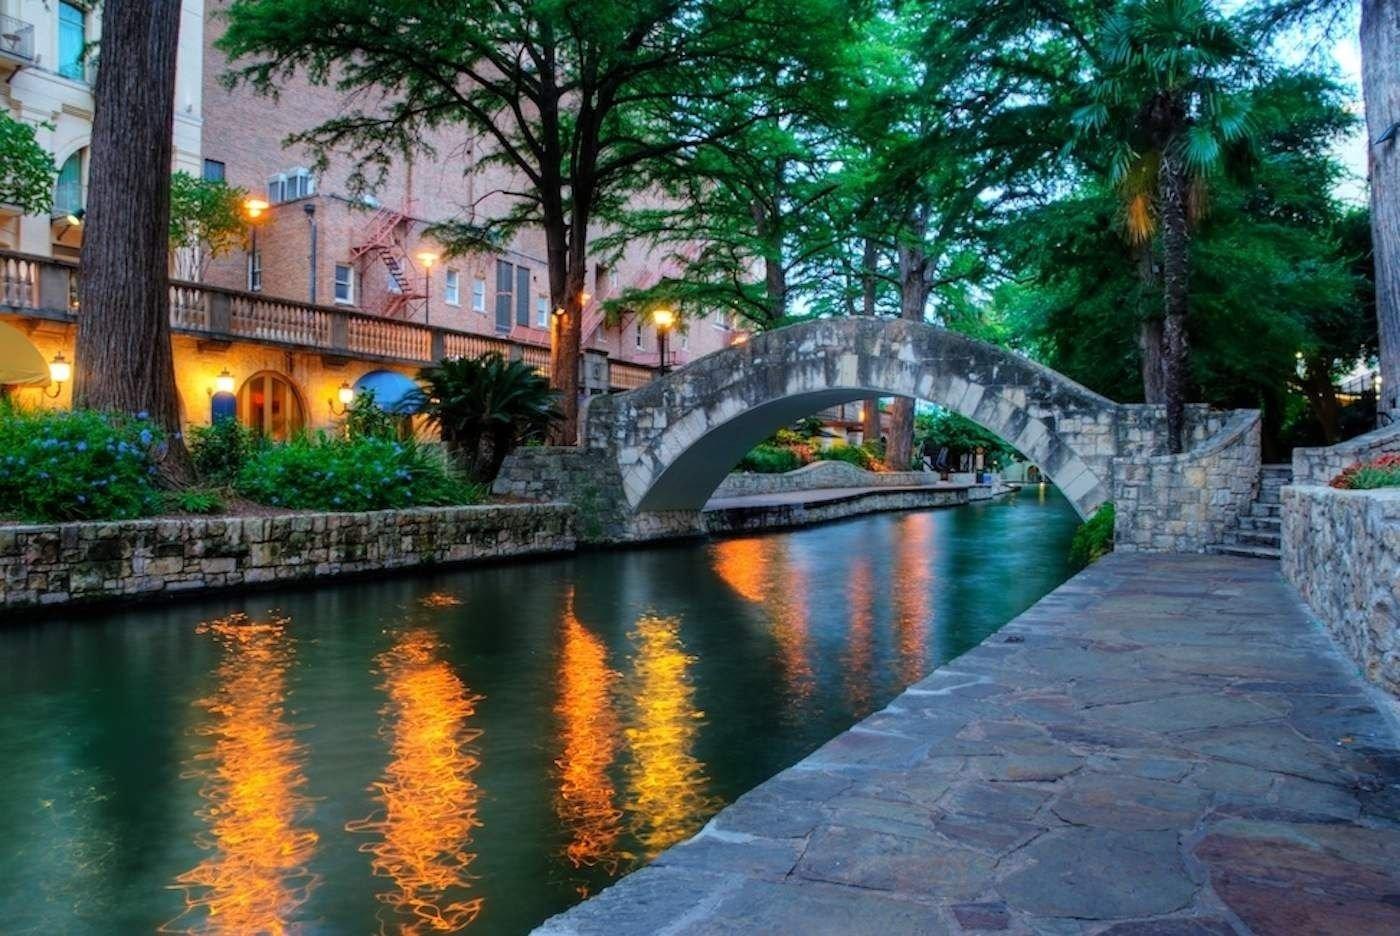 10 Stylish Date Ideas In San Antonio 20 legitimately great date ideas in san antonio san antonio texas